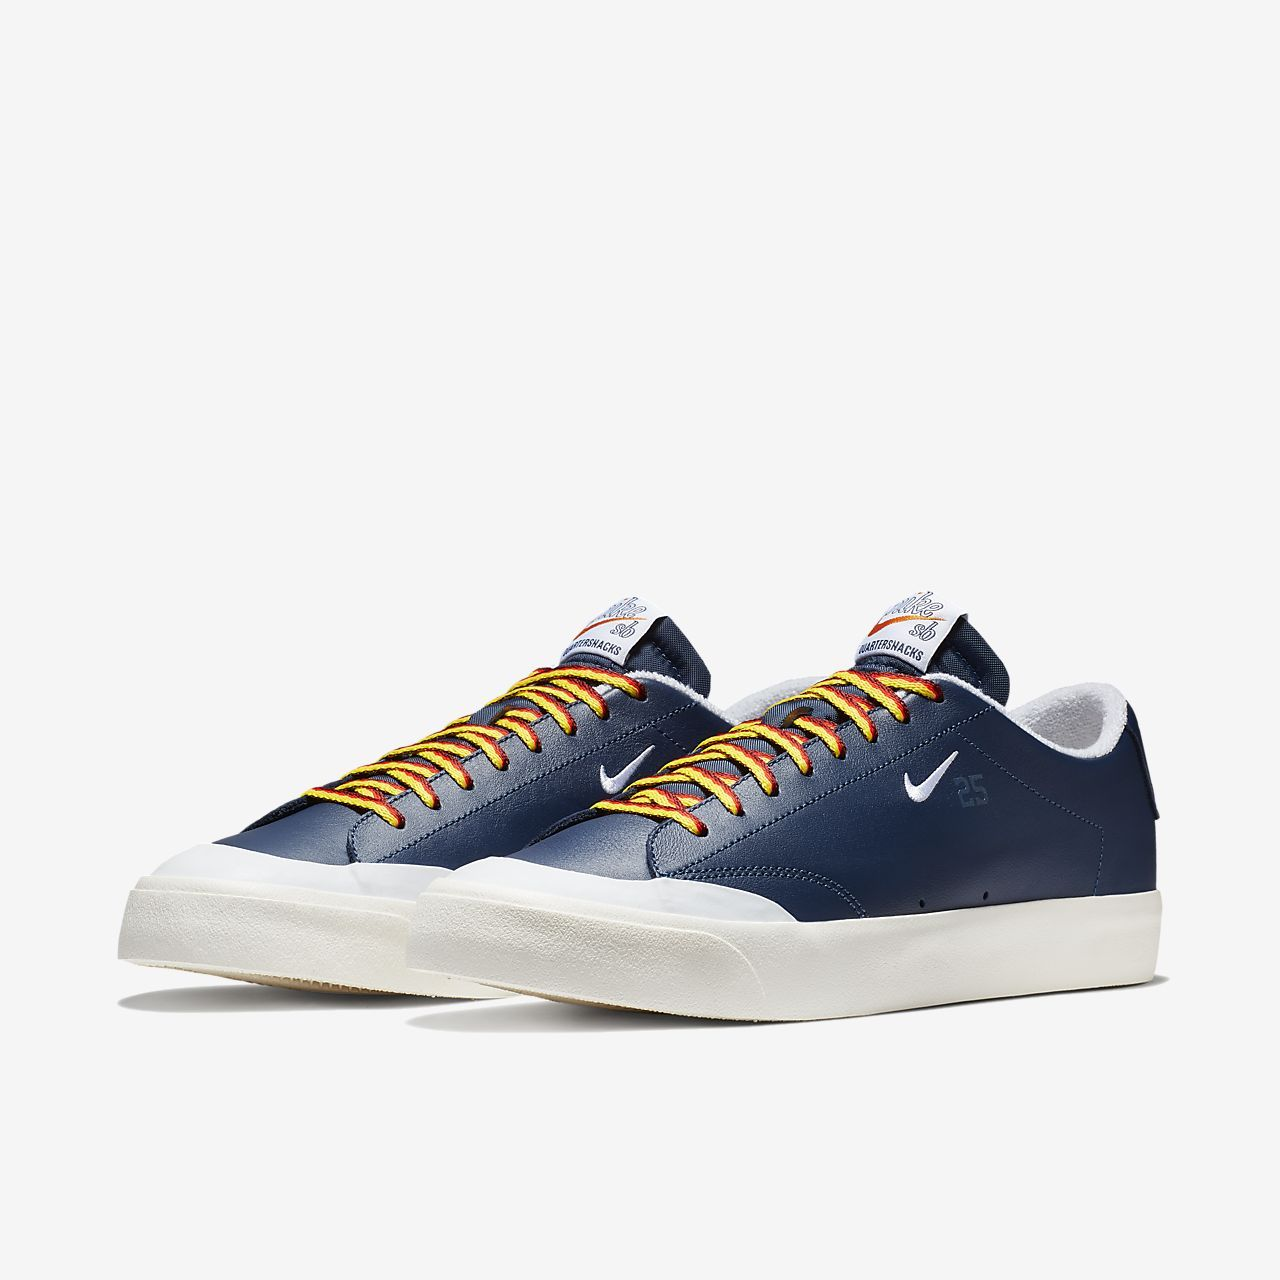 Nike Sb Zoom Blazer Low Xt Qs Men S Skateboarding Shoe Nike Sb Most Comfortable Sneakers Nike Training Shoes